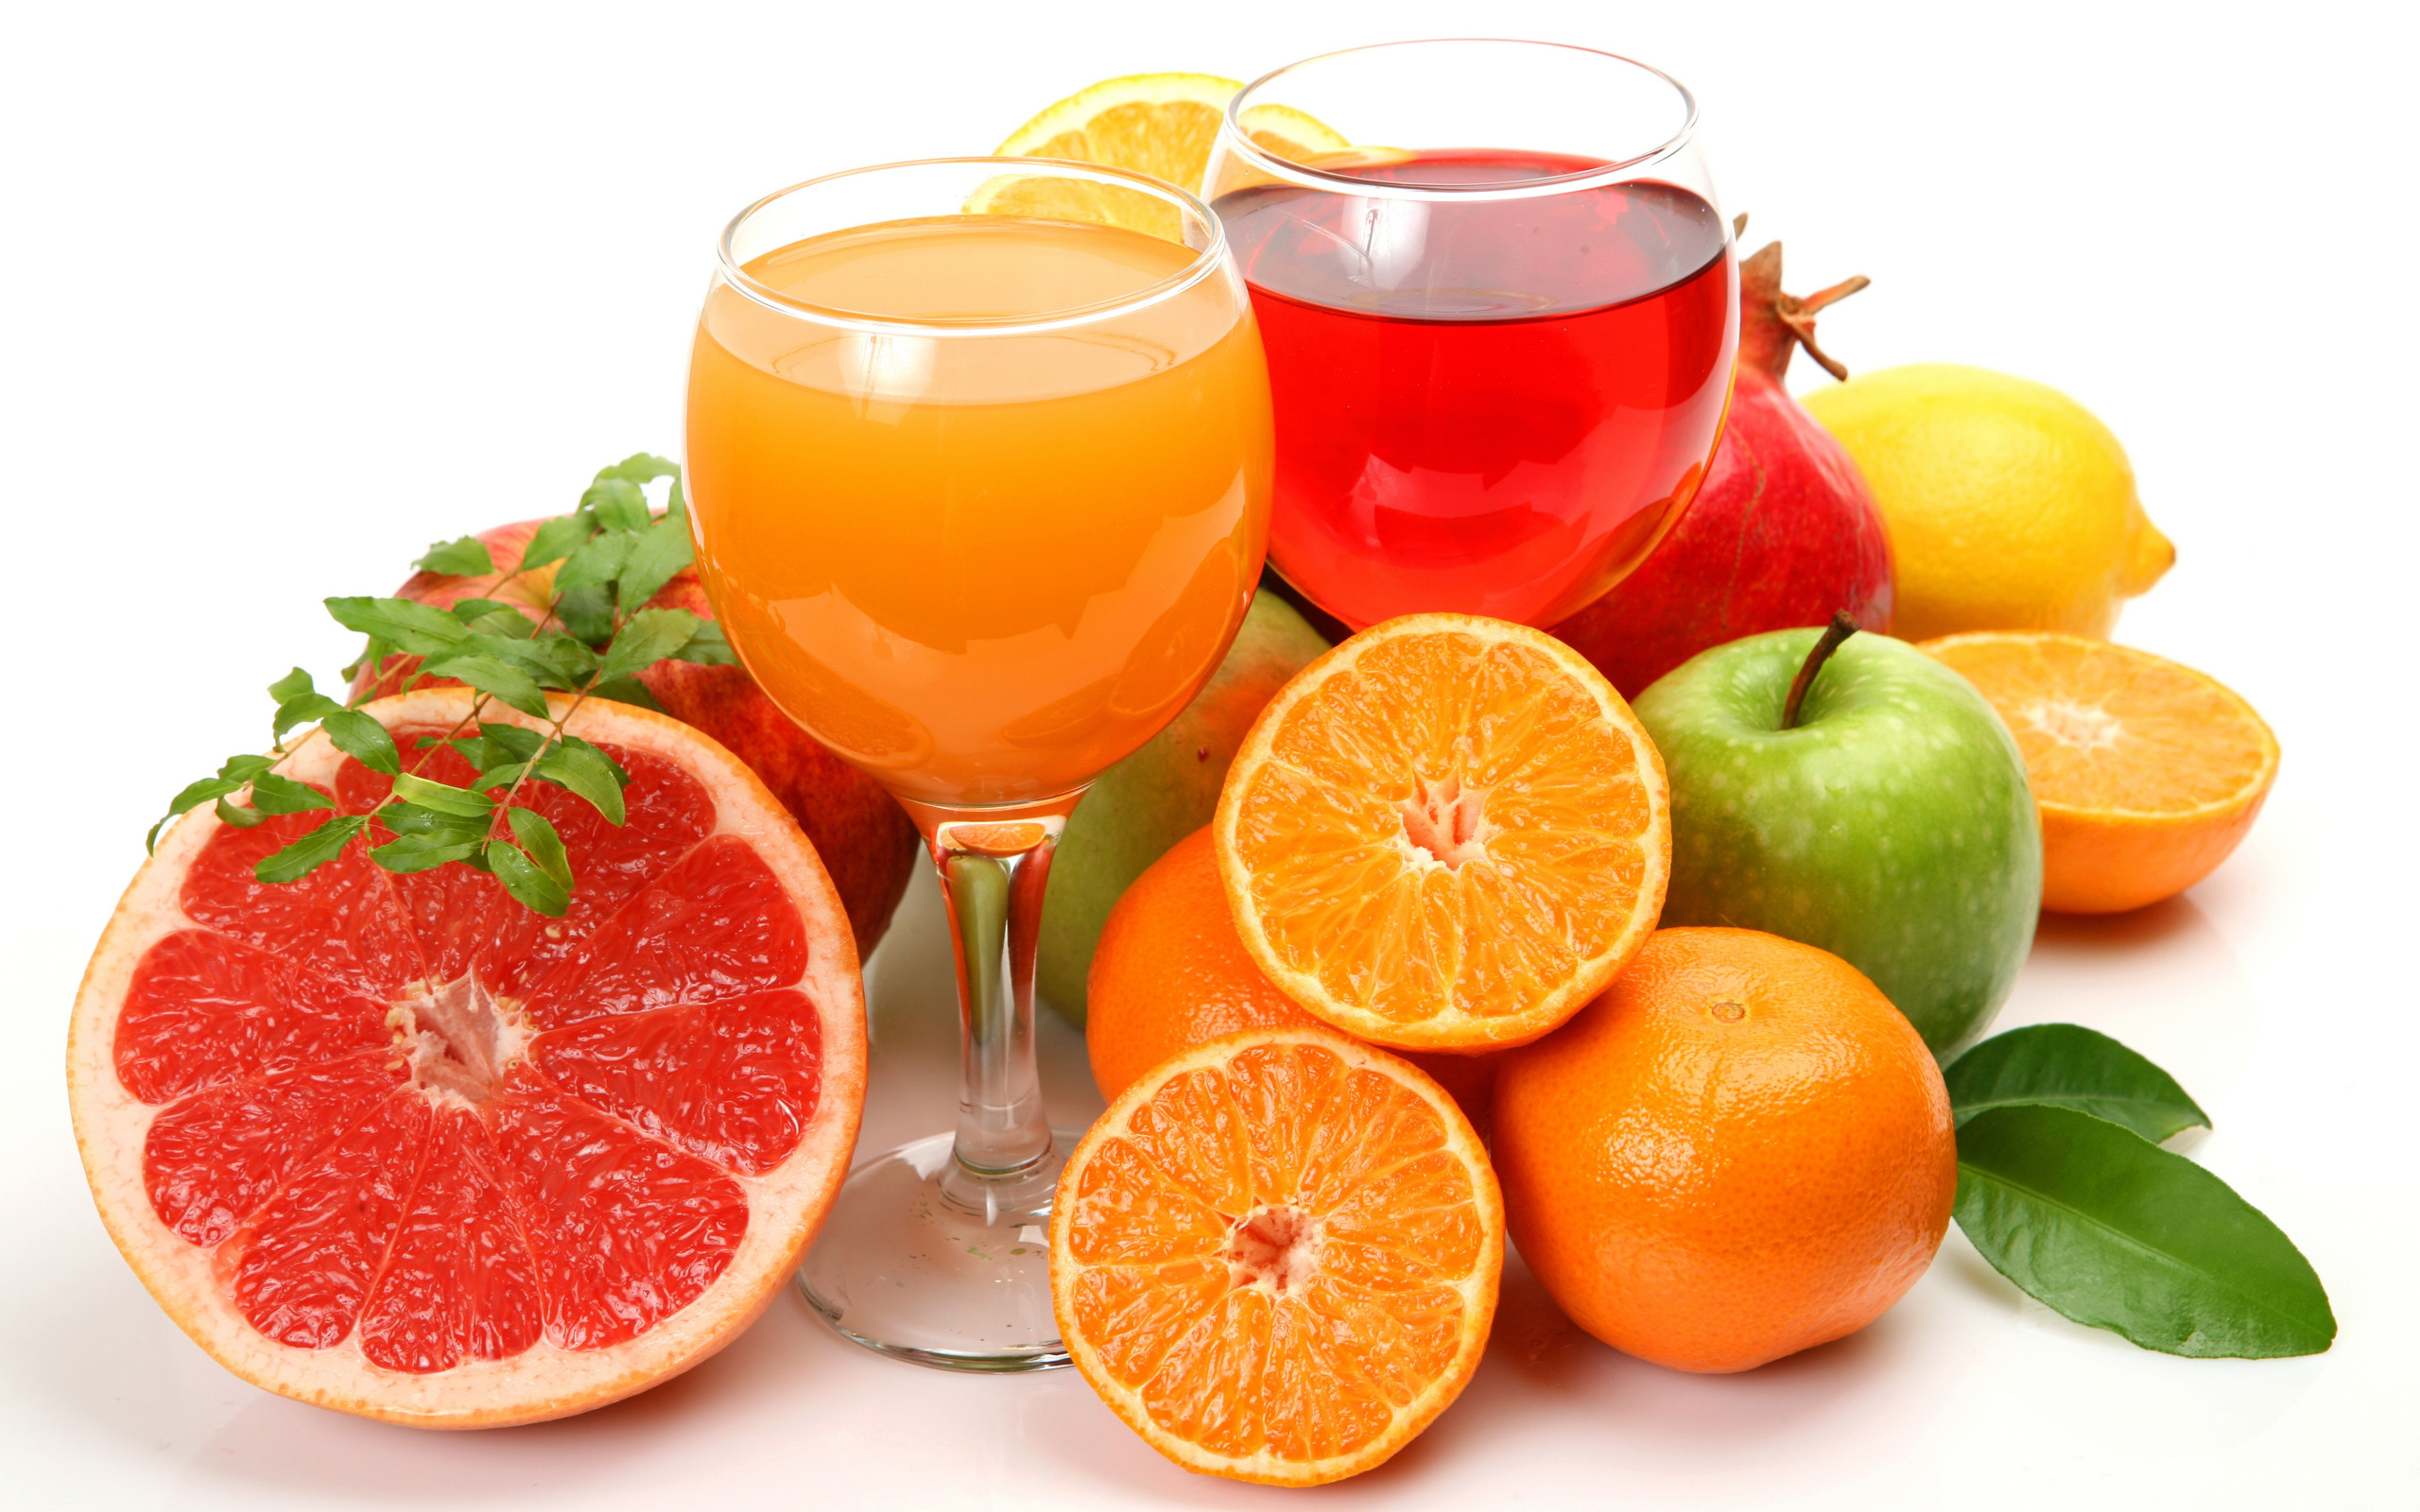 Fresh Fruit Juice Widescreen Wallpaper Widewallpapersnet 2560x1600px